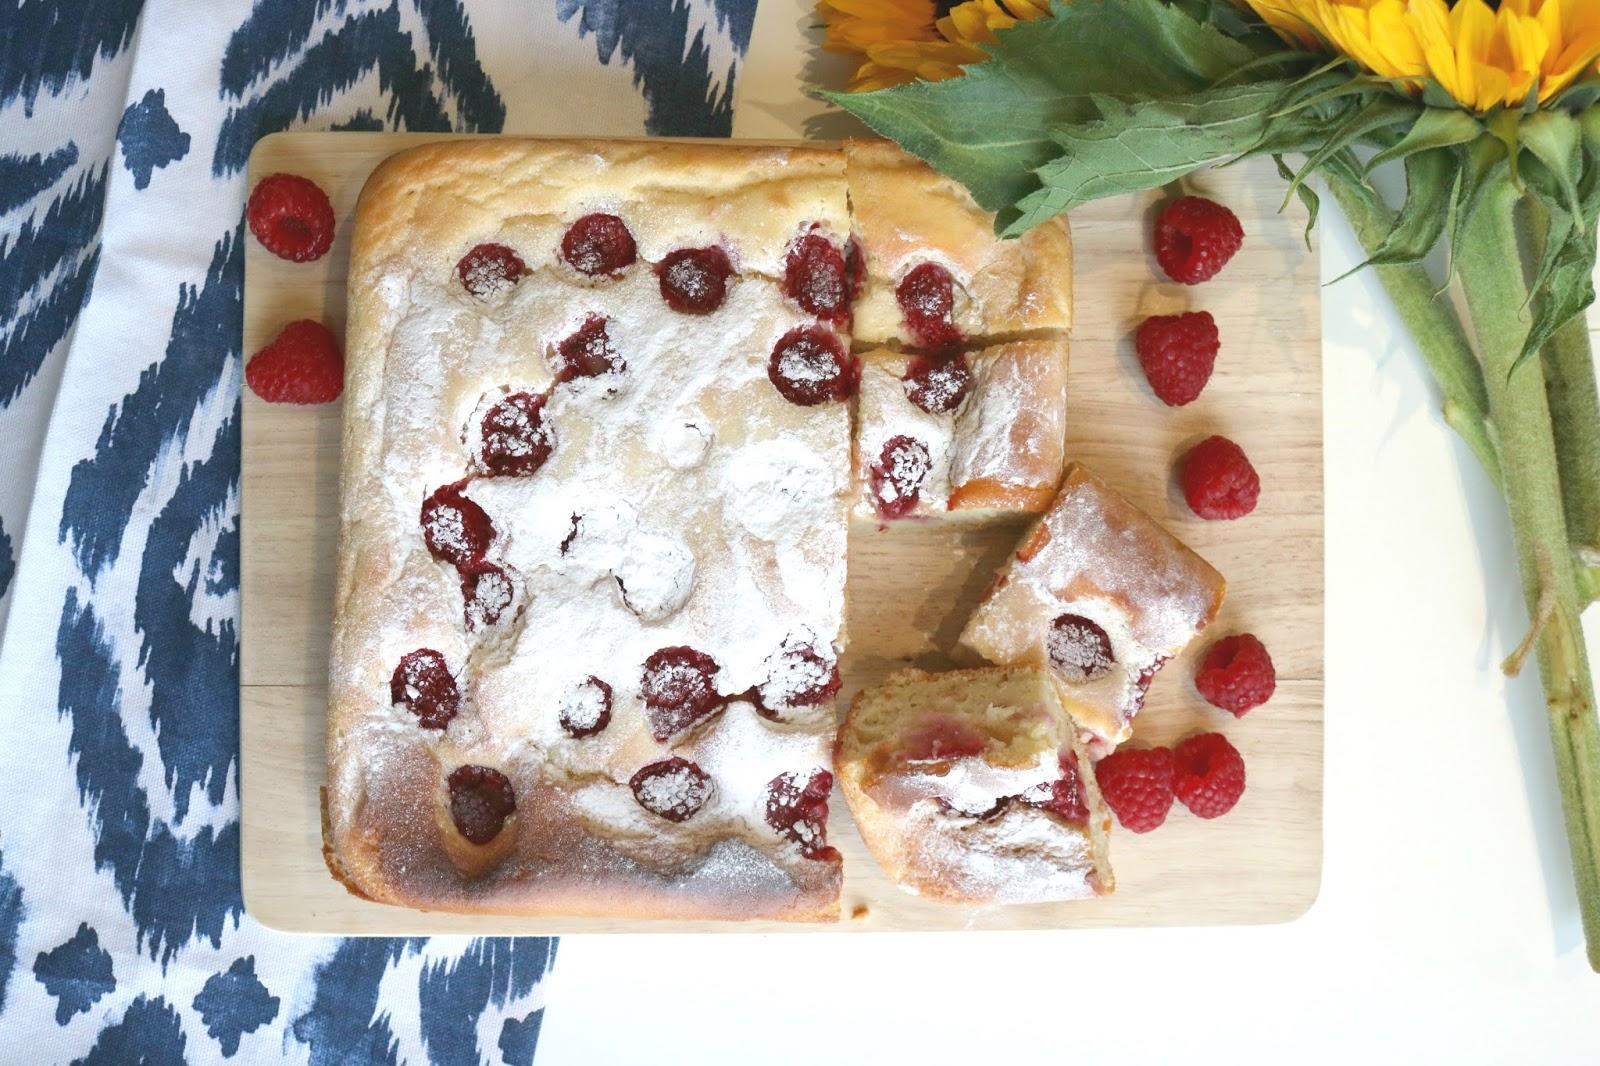 FRENCH YOGHURT CAKE